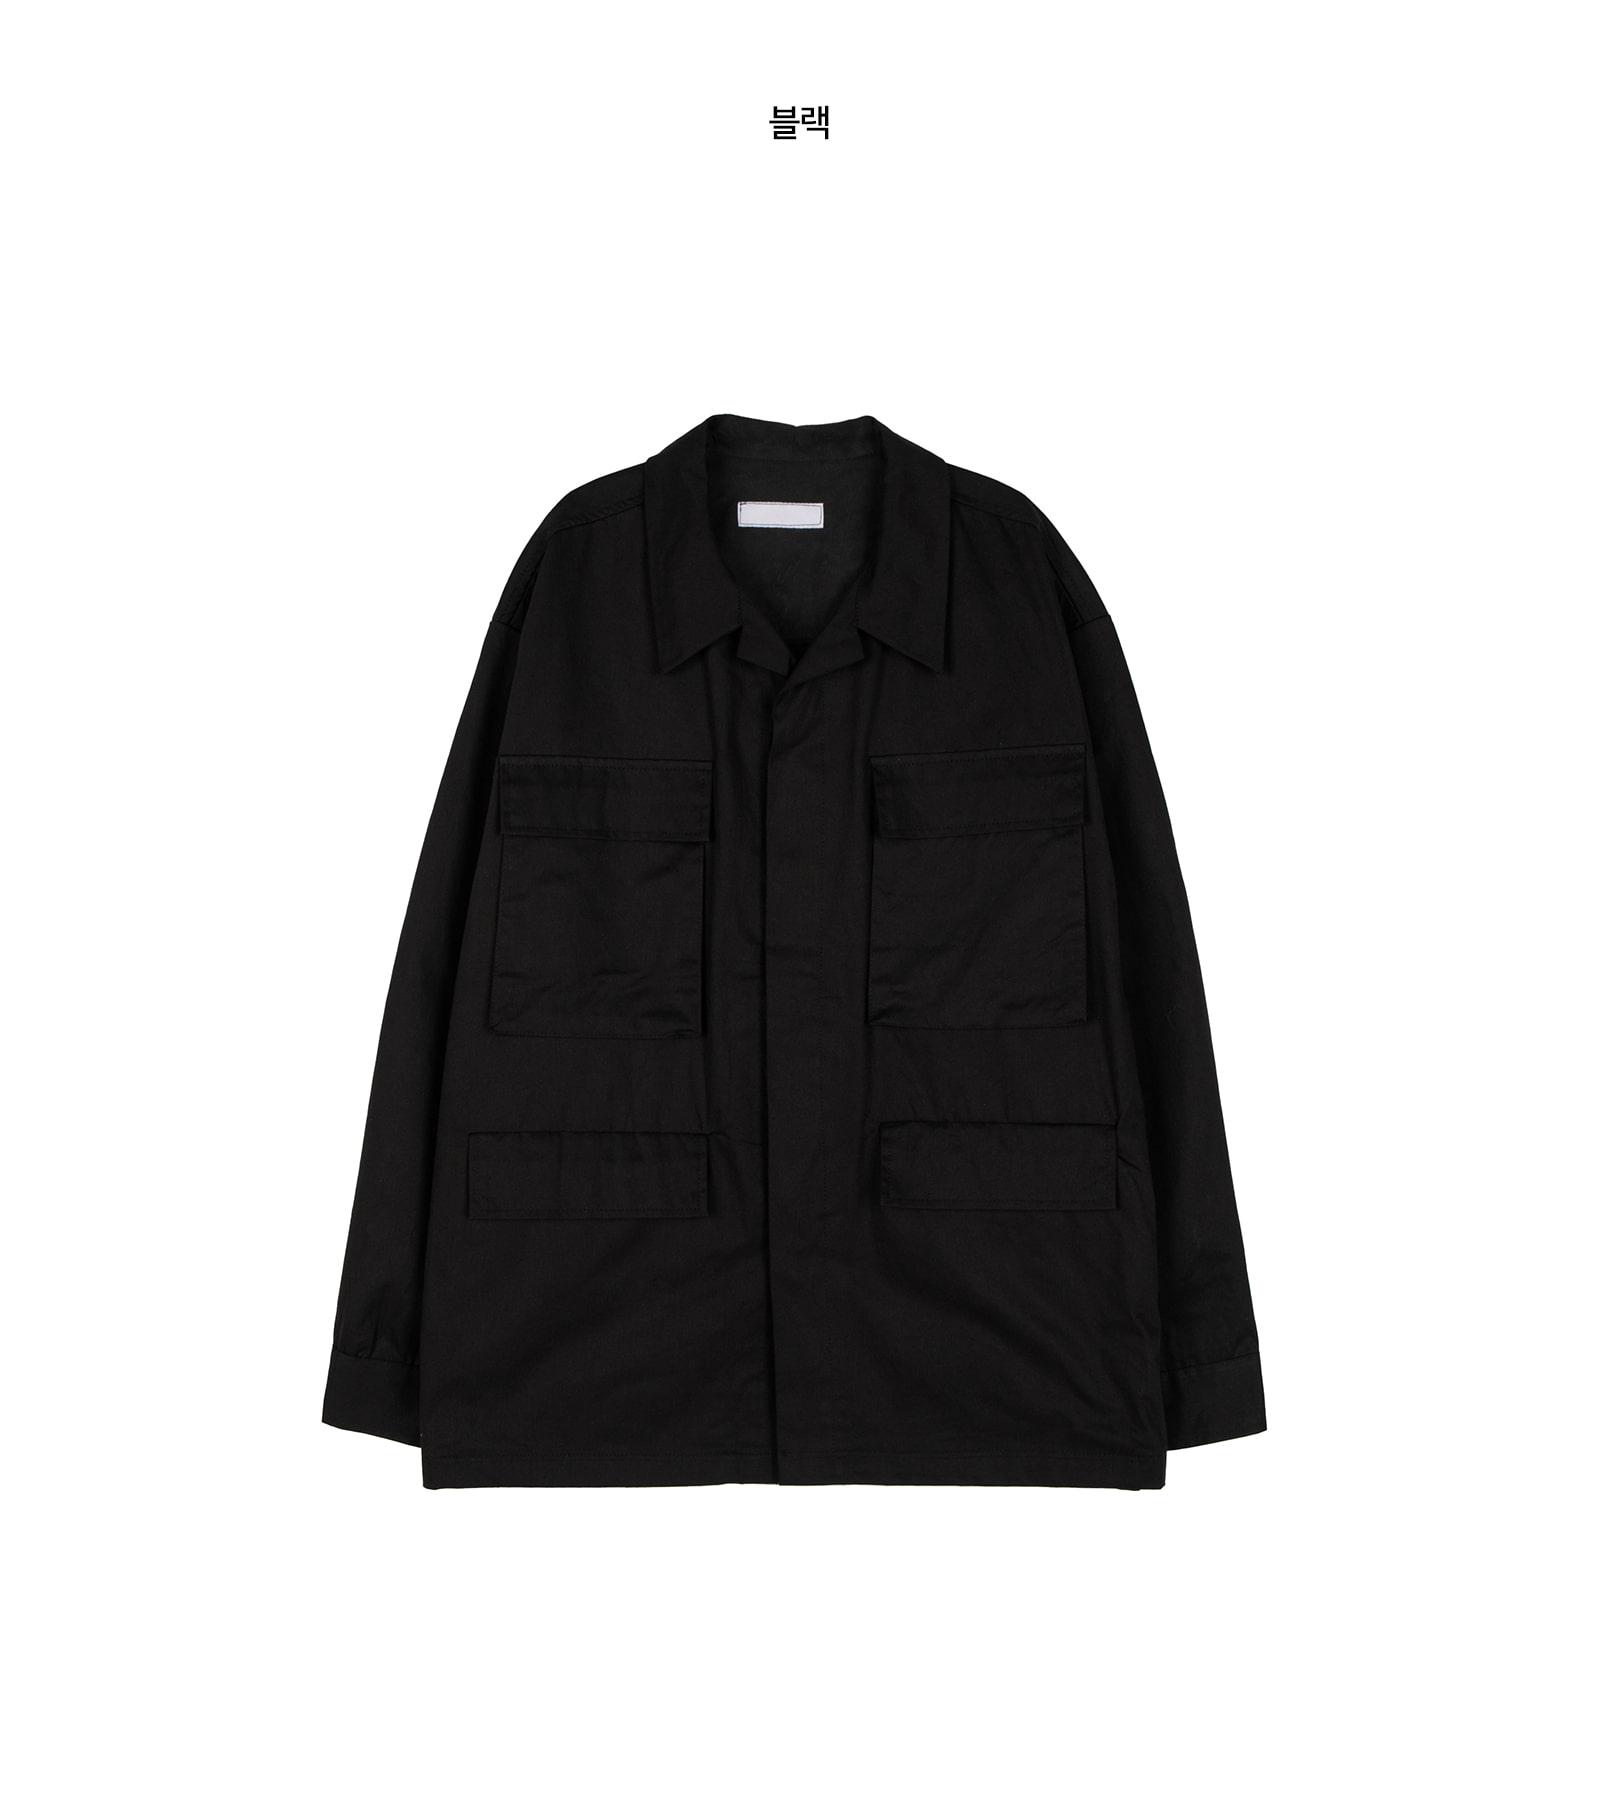 Unisex collar pocket cotton jacket